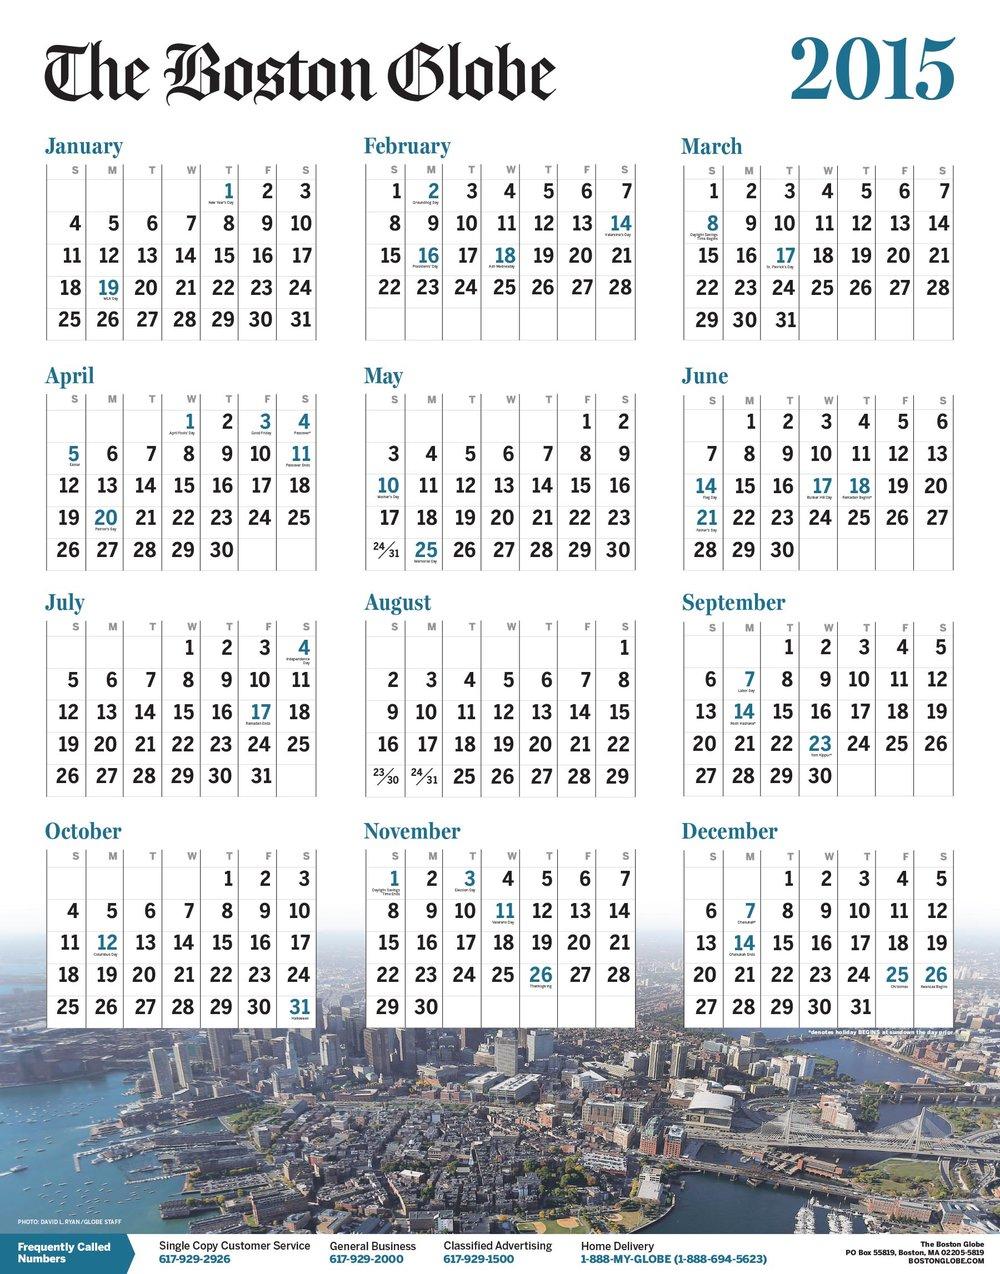 Boston Globe 2015 Calendar